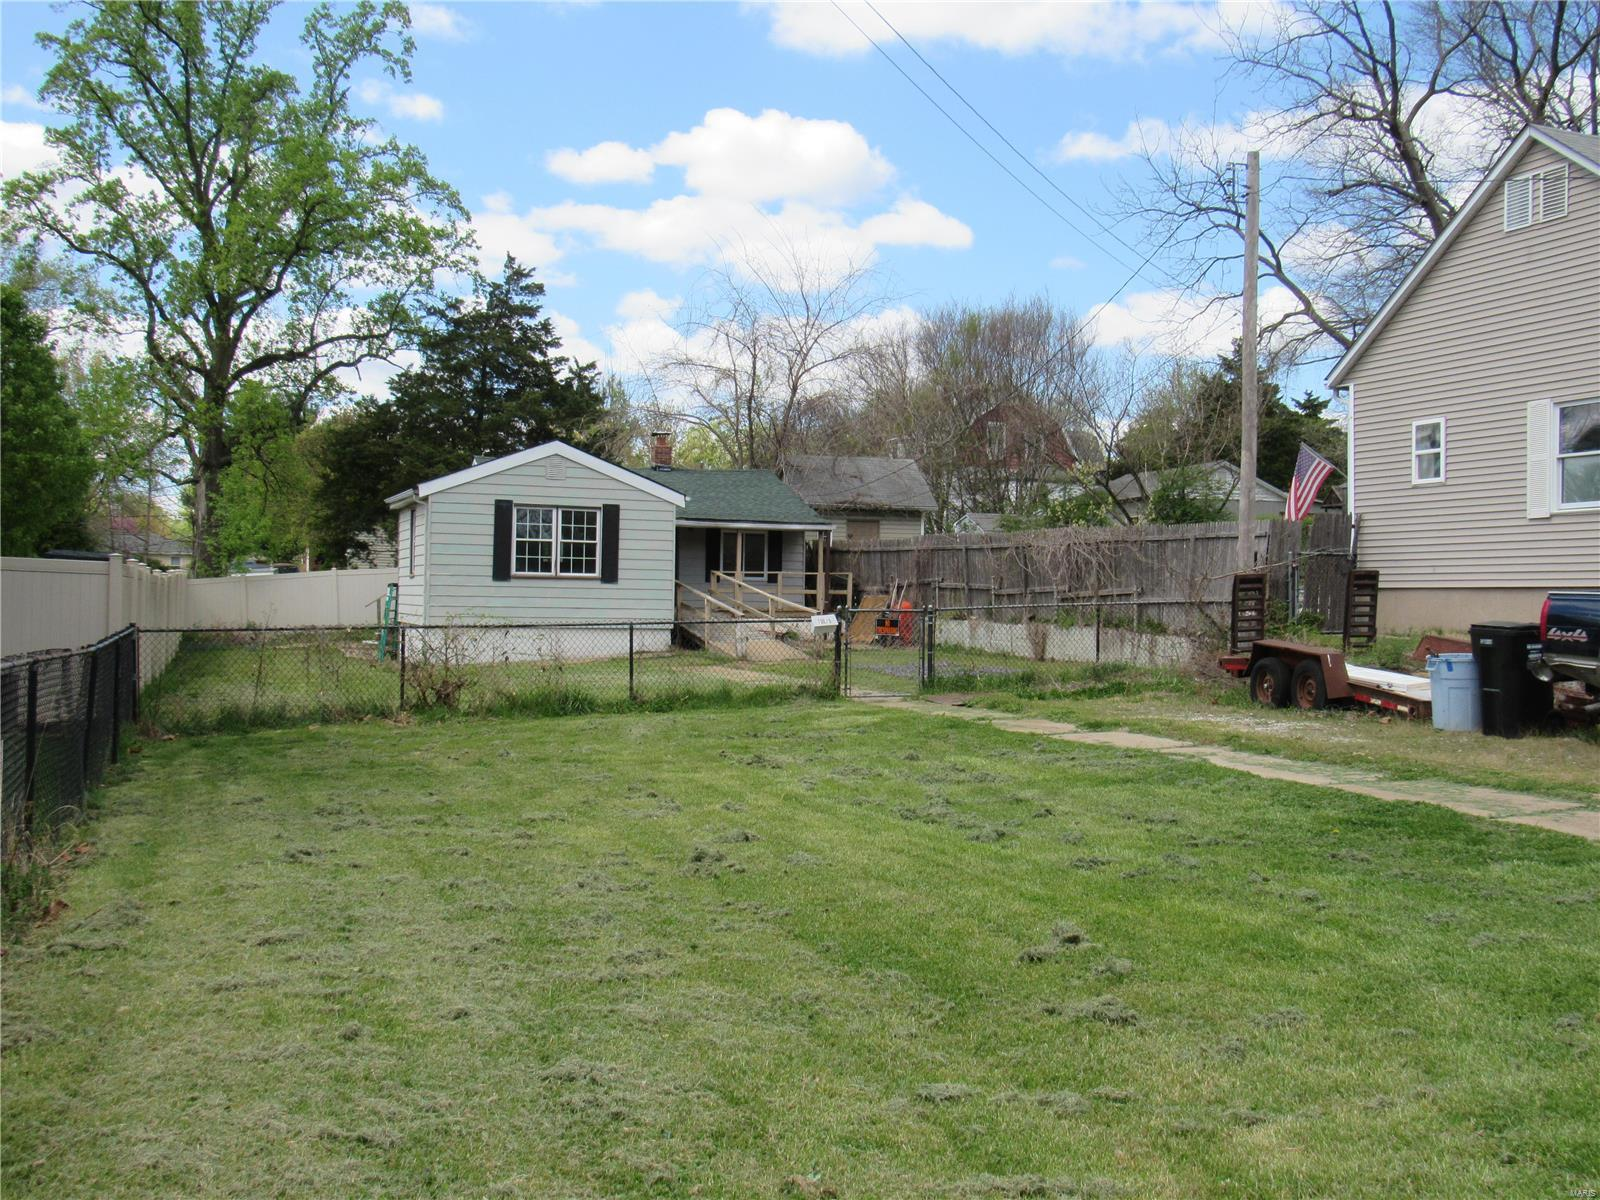 7925 Fleta Property Photo - Affton, MO real estate listing